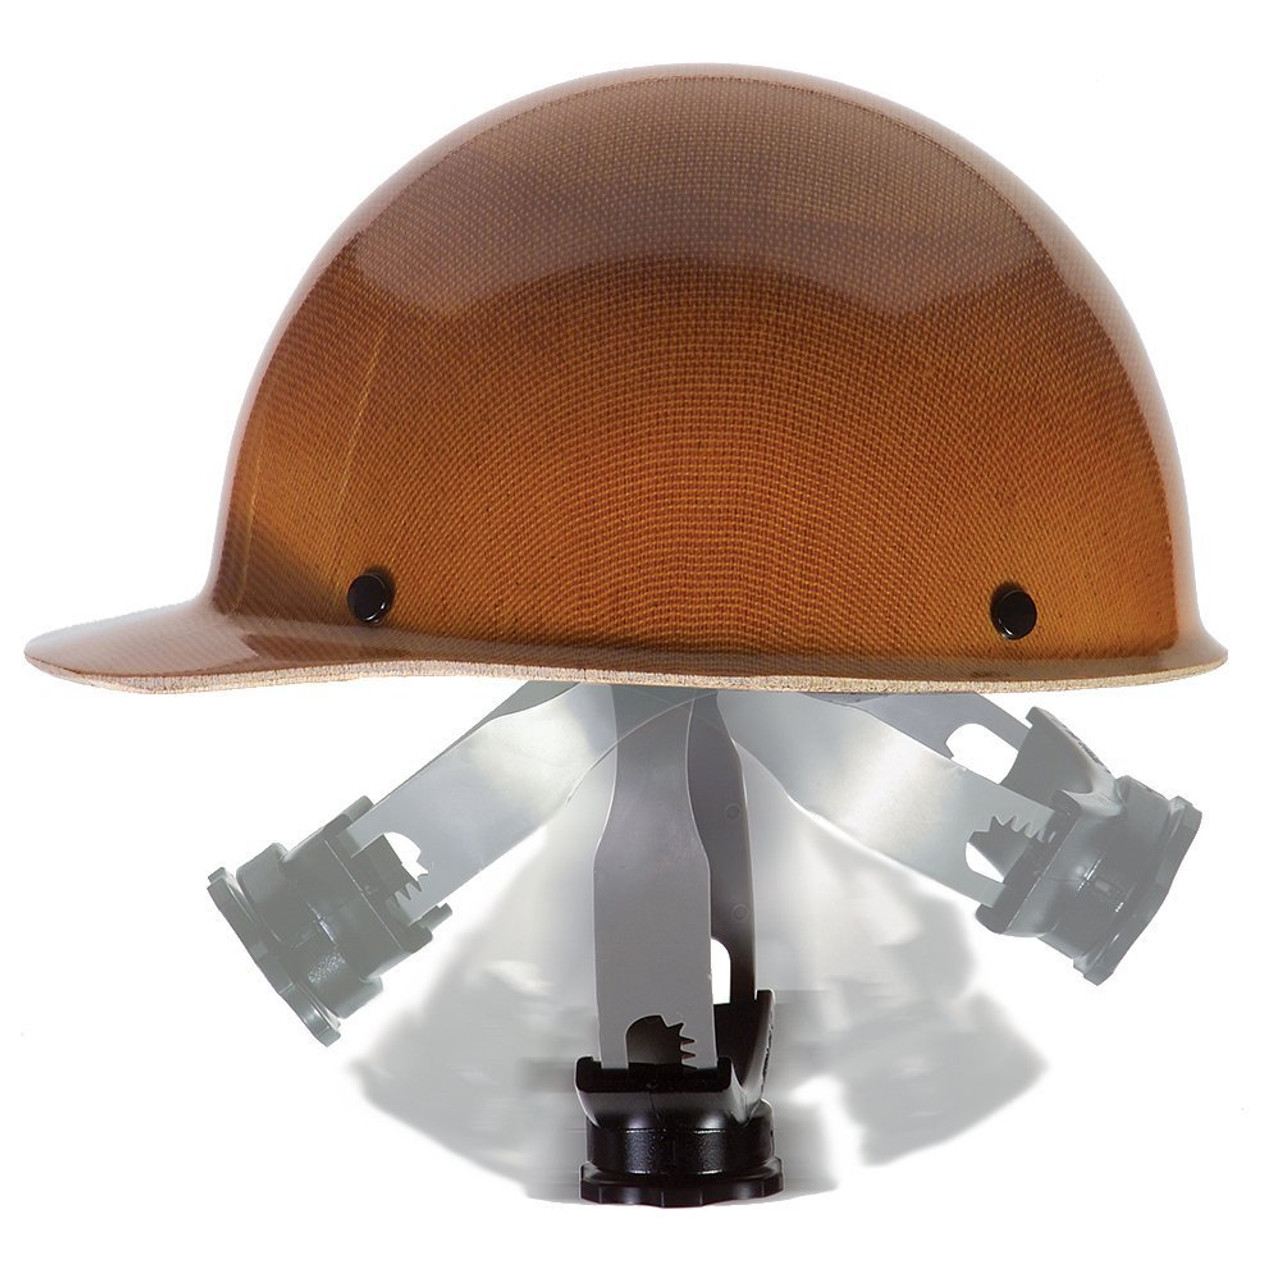 816654 MSA Plastic//Nylon Hard Hat Suspension,Ratchet,4